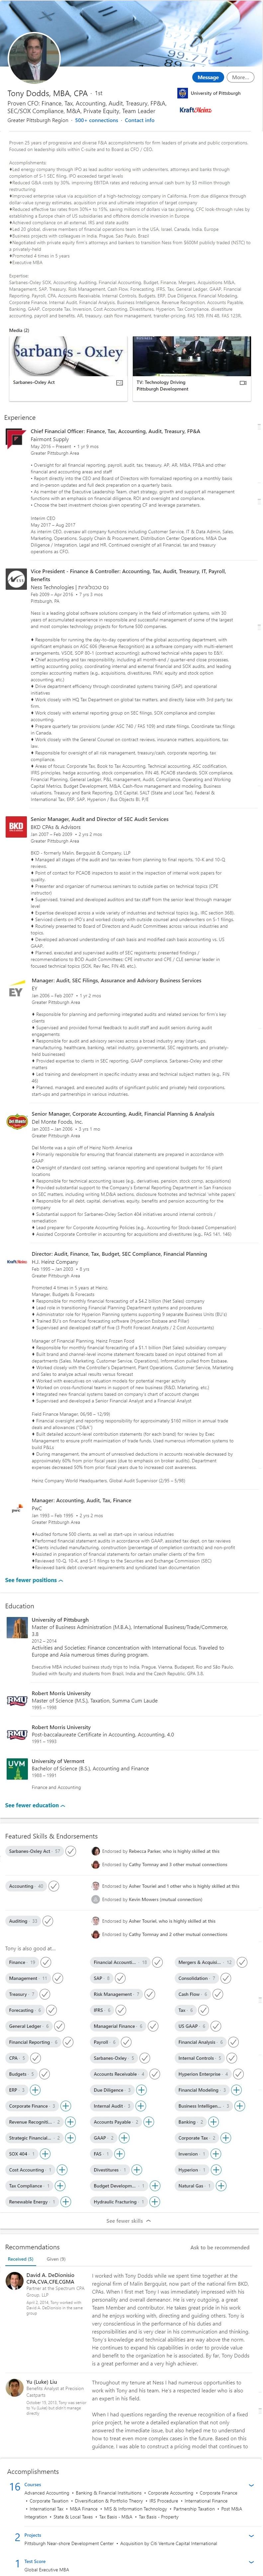 Linkedin Profile Example CFO Finance CPA Accounting